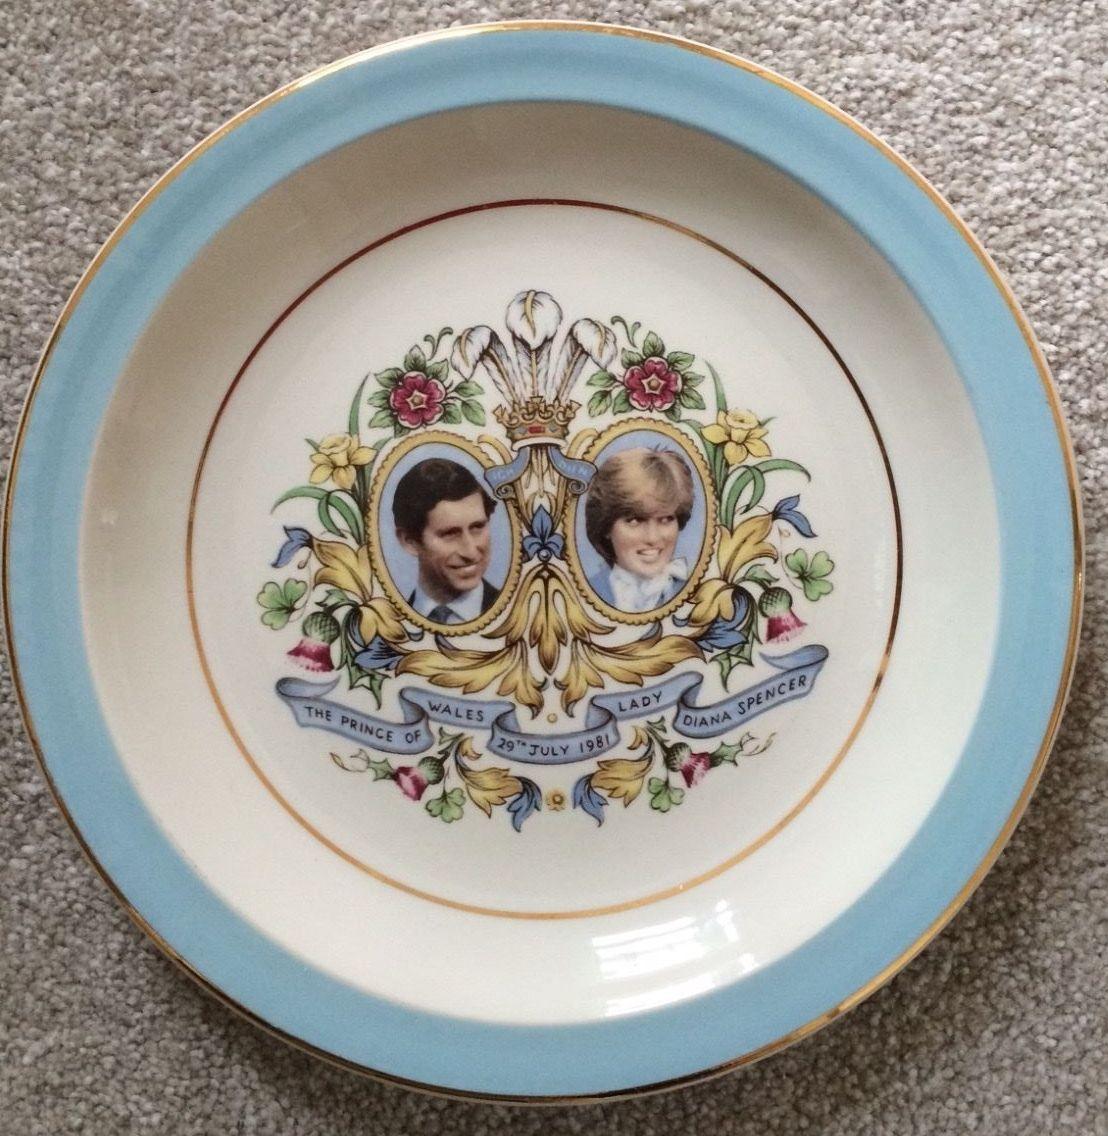 Prince Charles & Lady Diana Spencer Wedding Commemorative